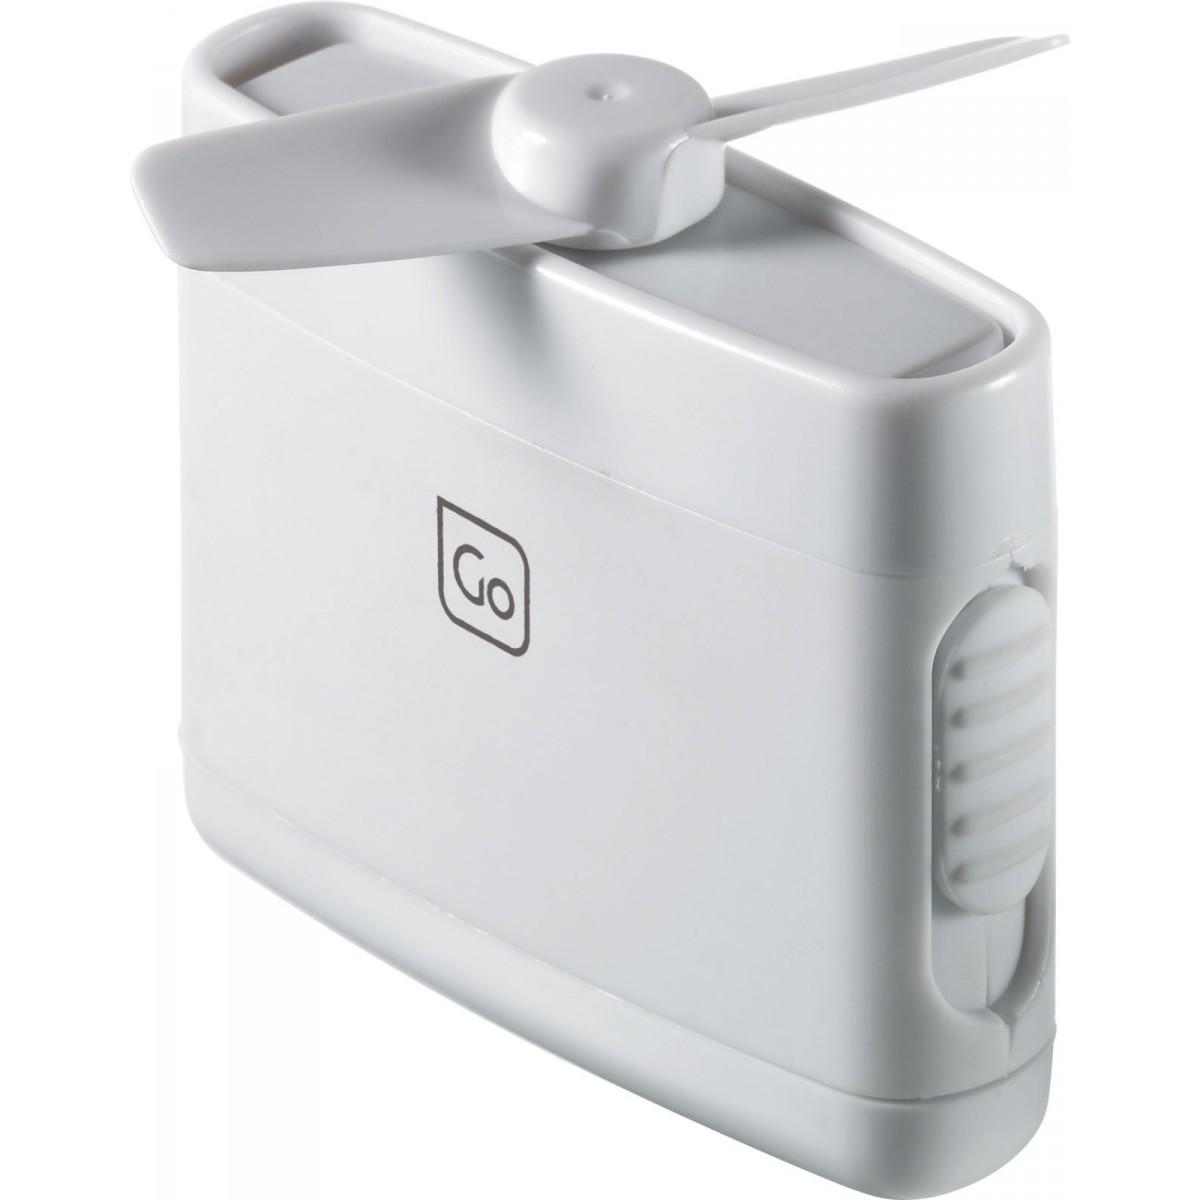 Small Travel Fan : Go travel e ultra compact discreet quiet micro fan